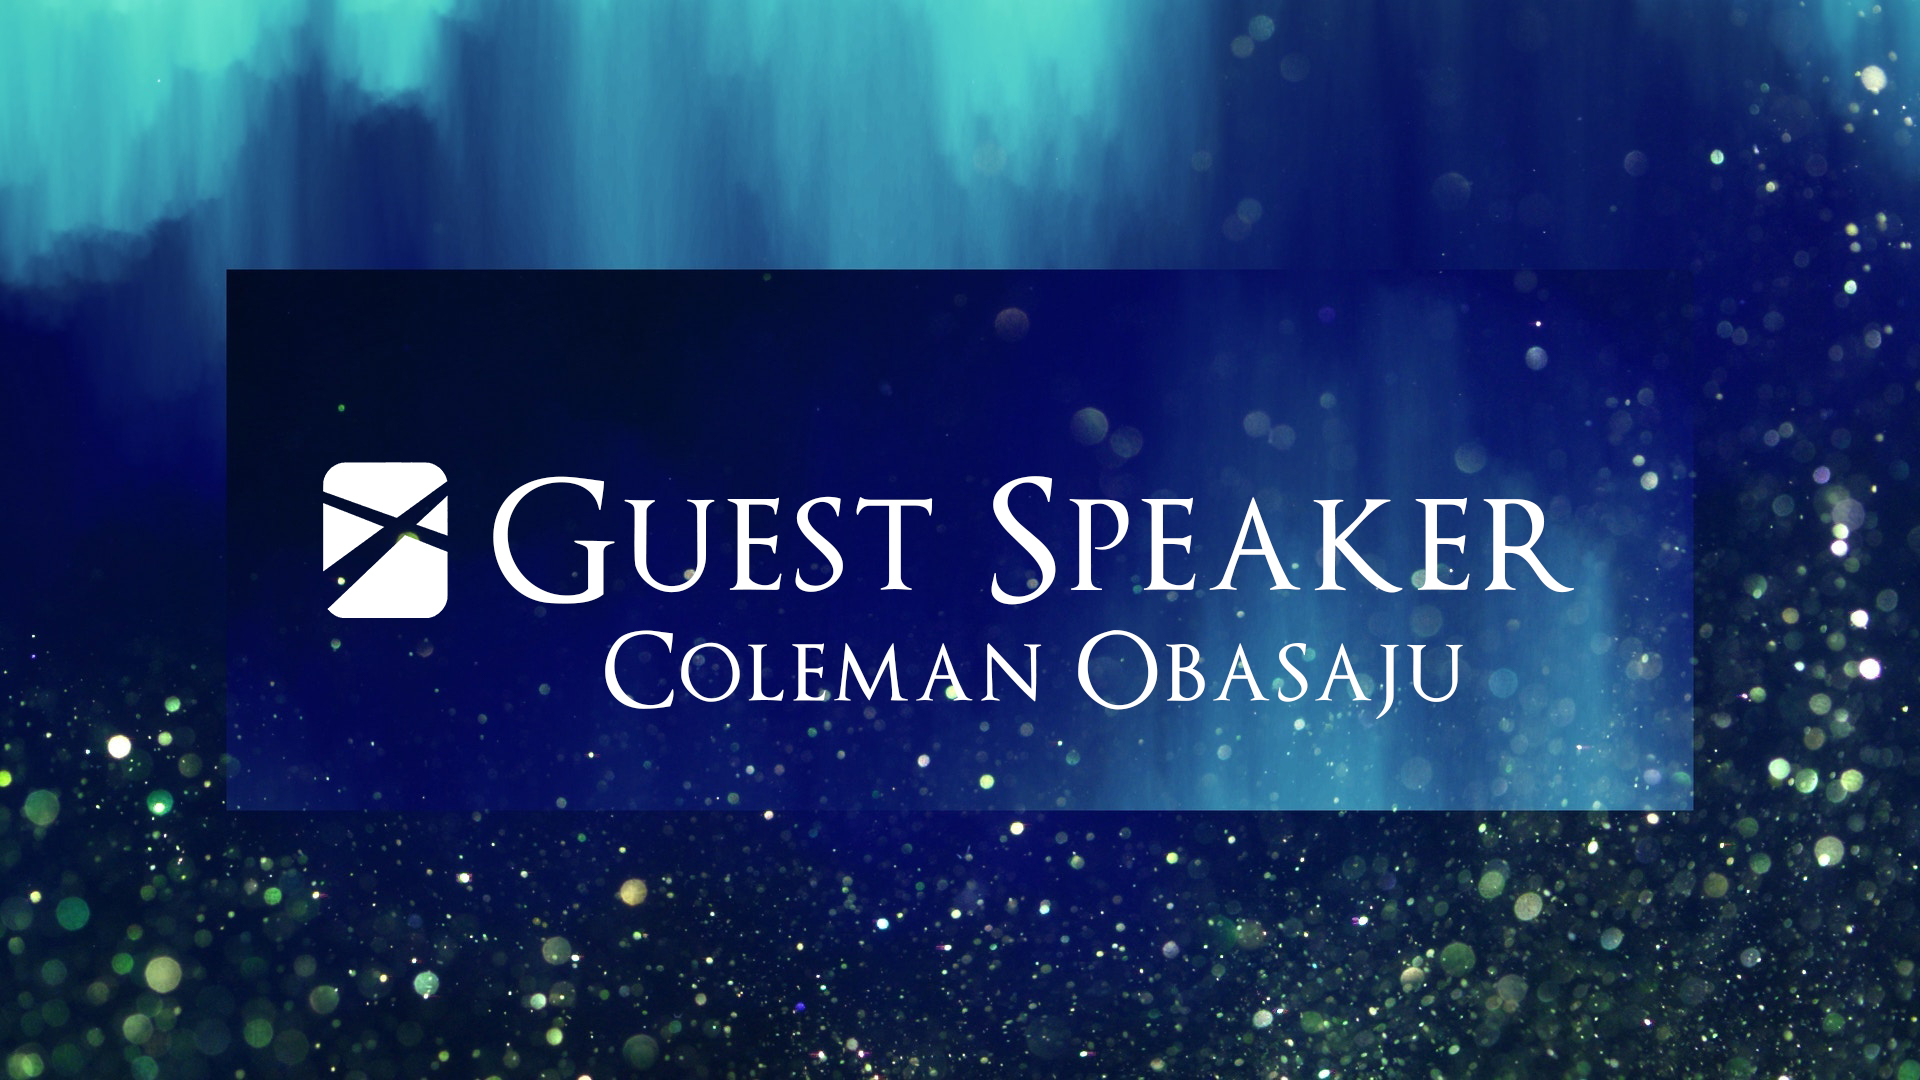 Guest Speaker Coleman Obasaju.jpg